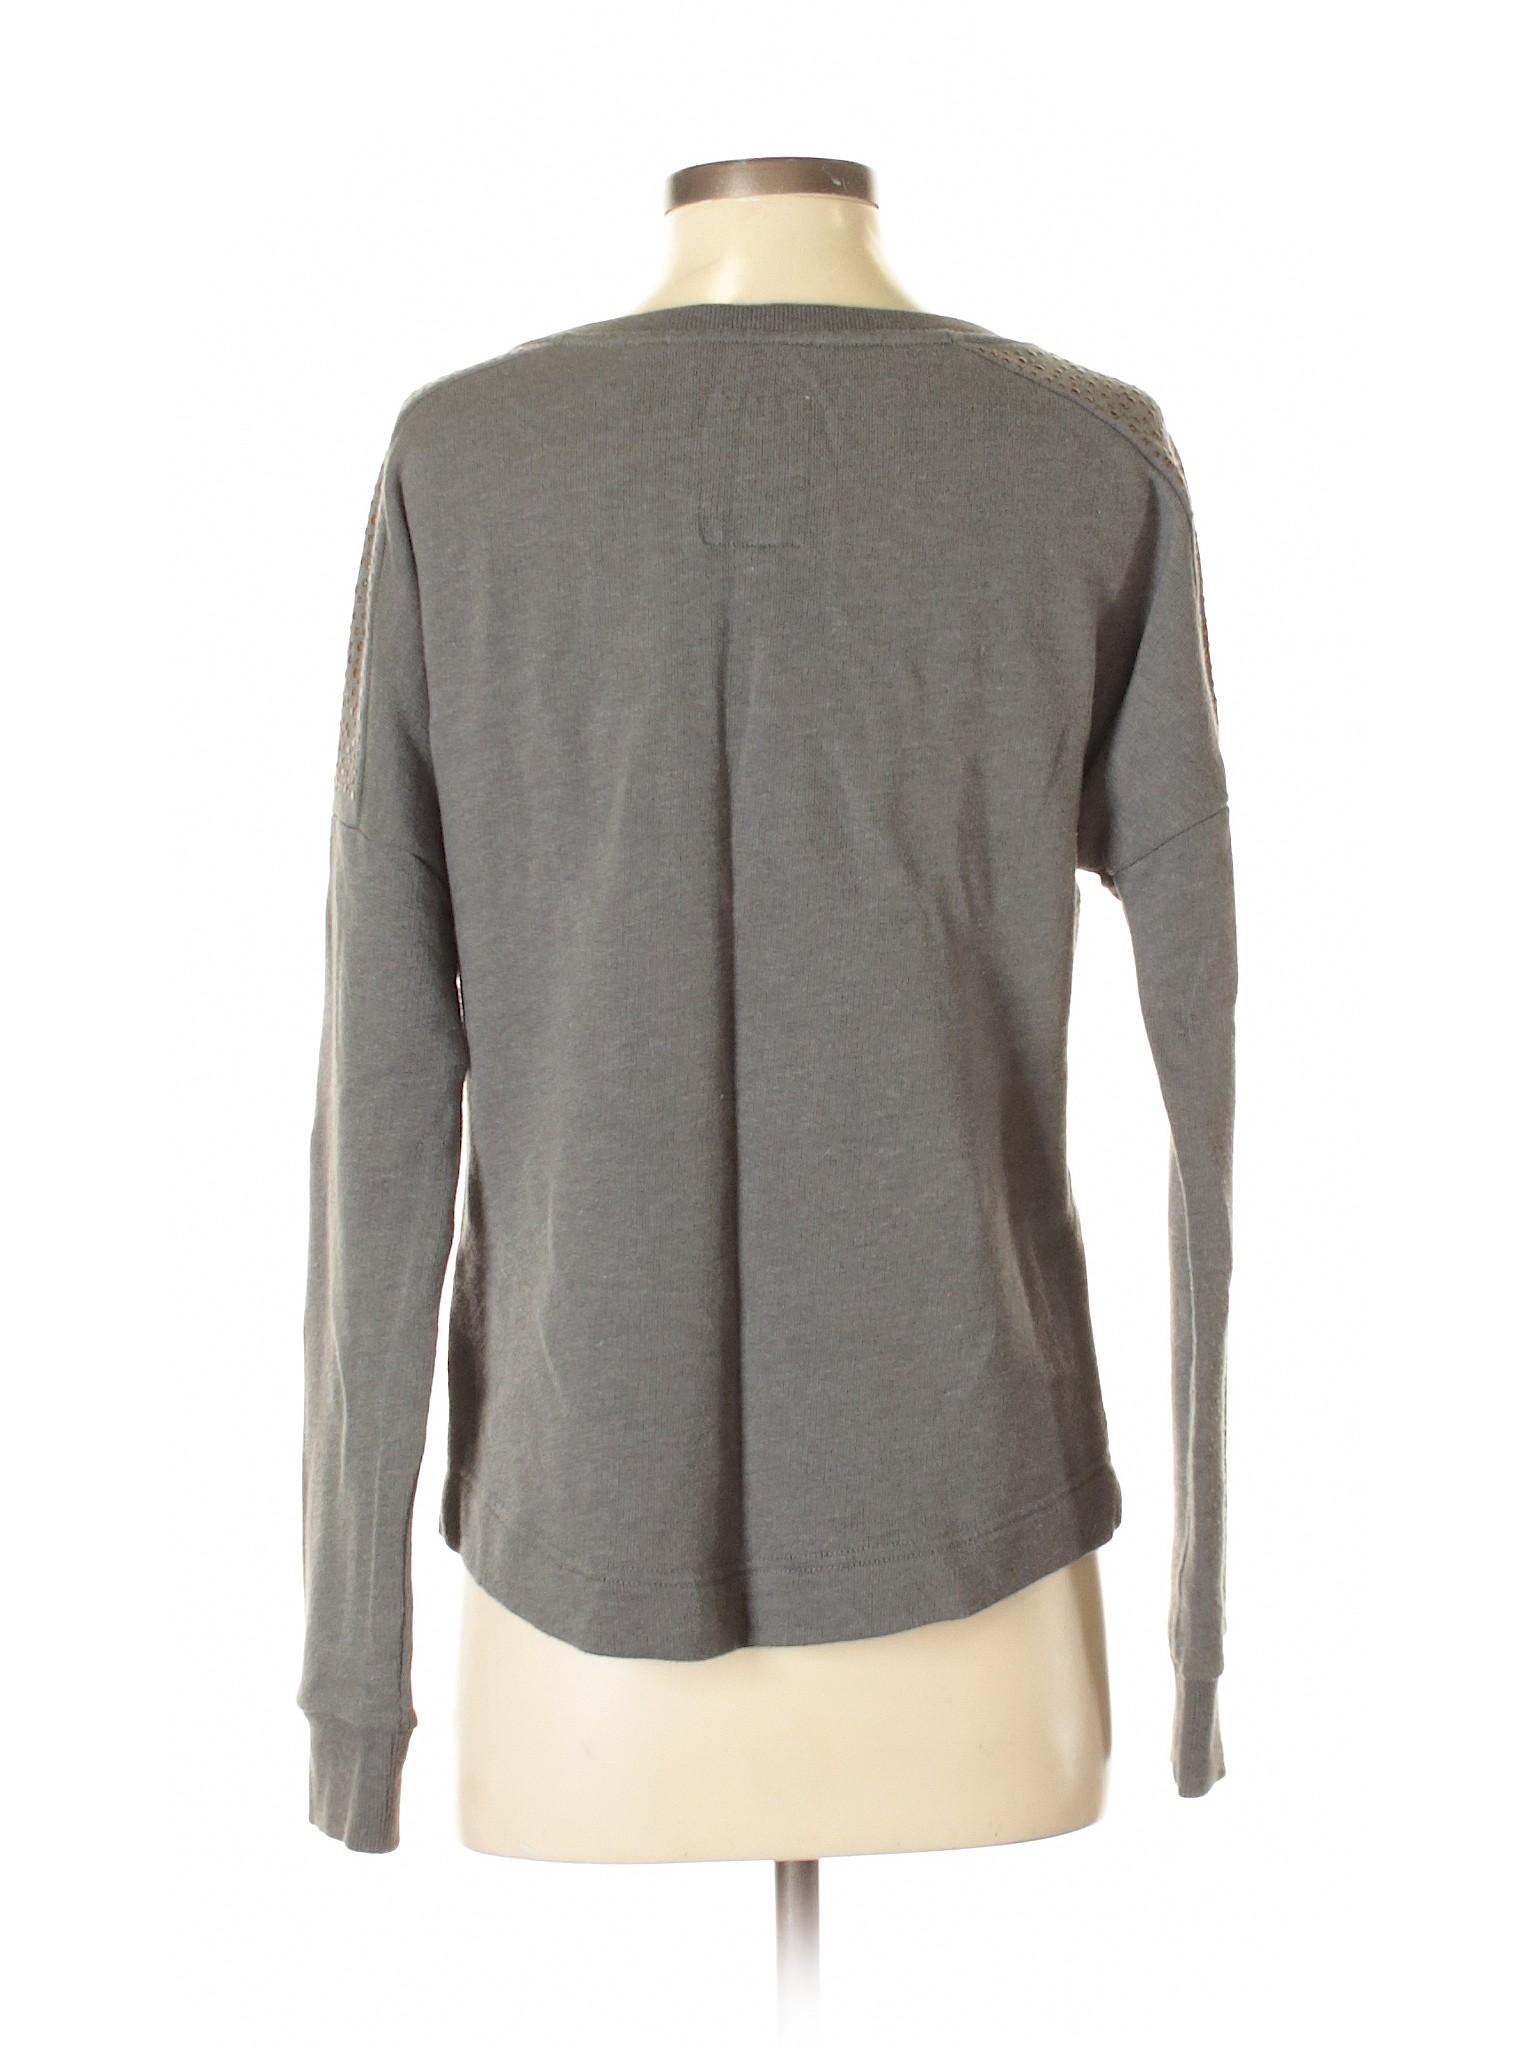 Sweater Pullover winter winter Esprit Boutique Sweater Esprit Boutique Pullover 7dOUqfxUw